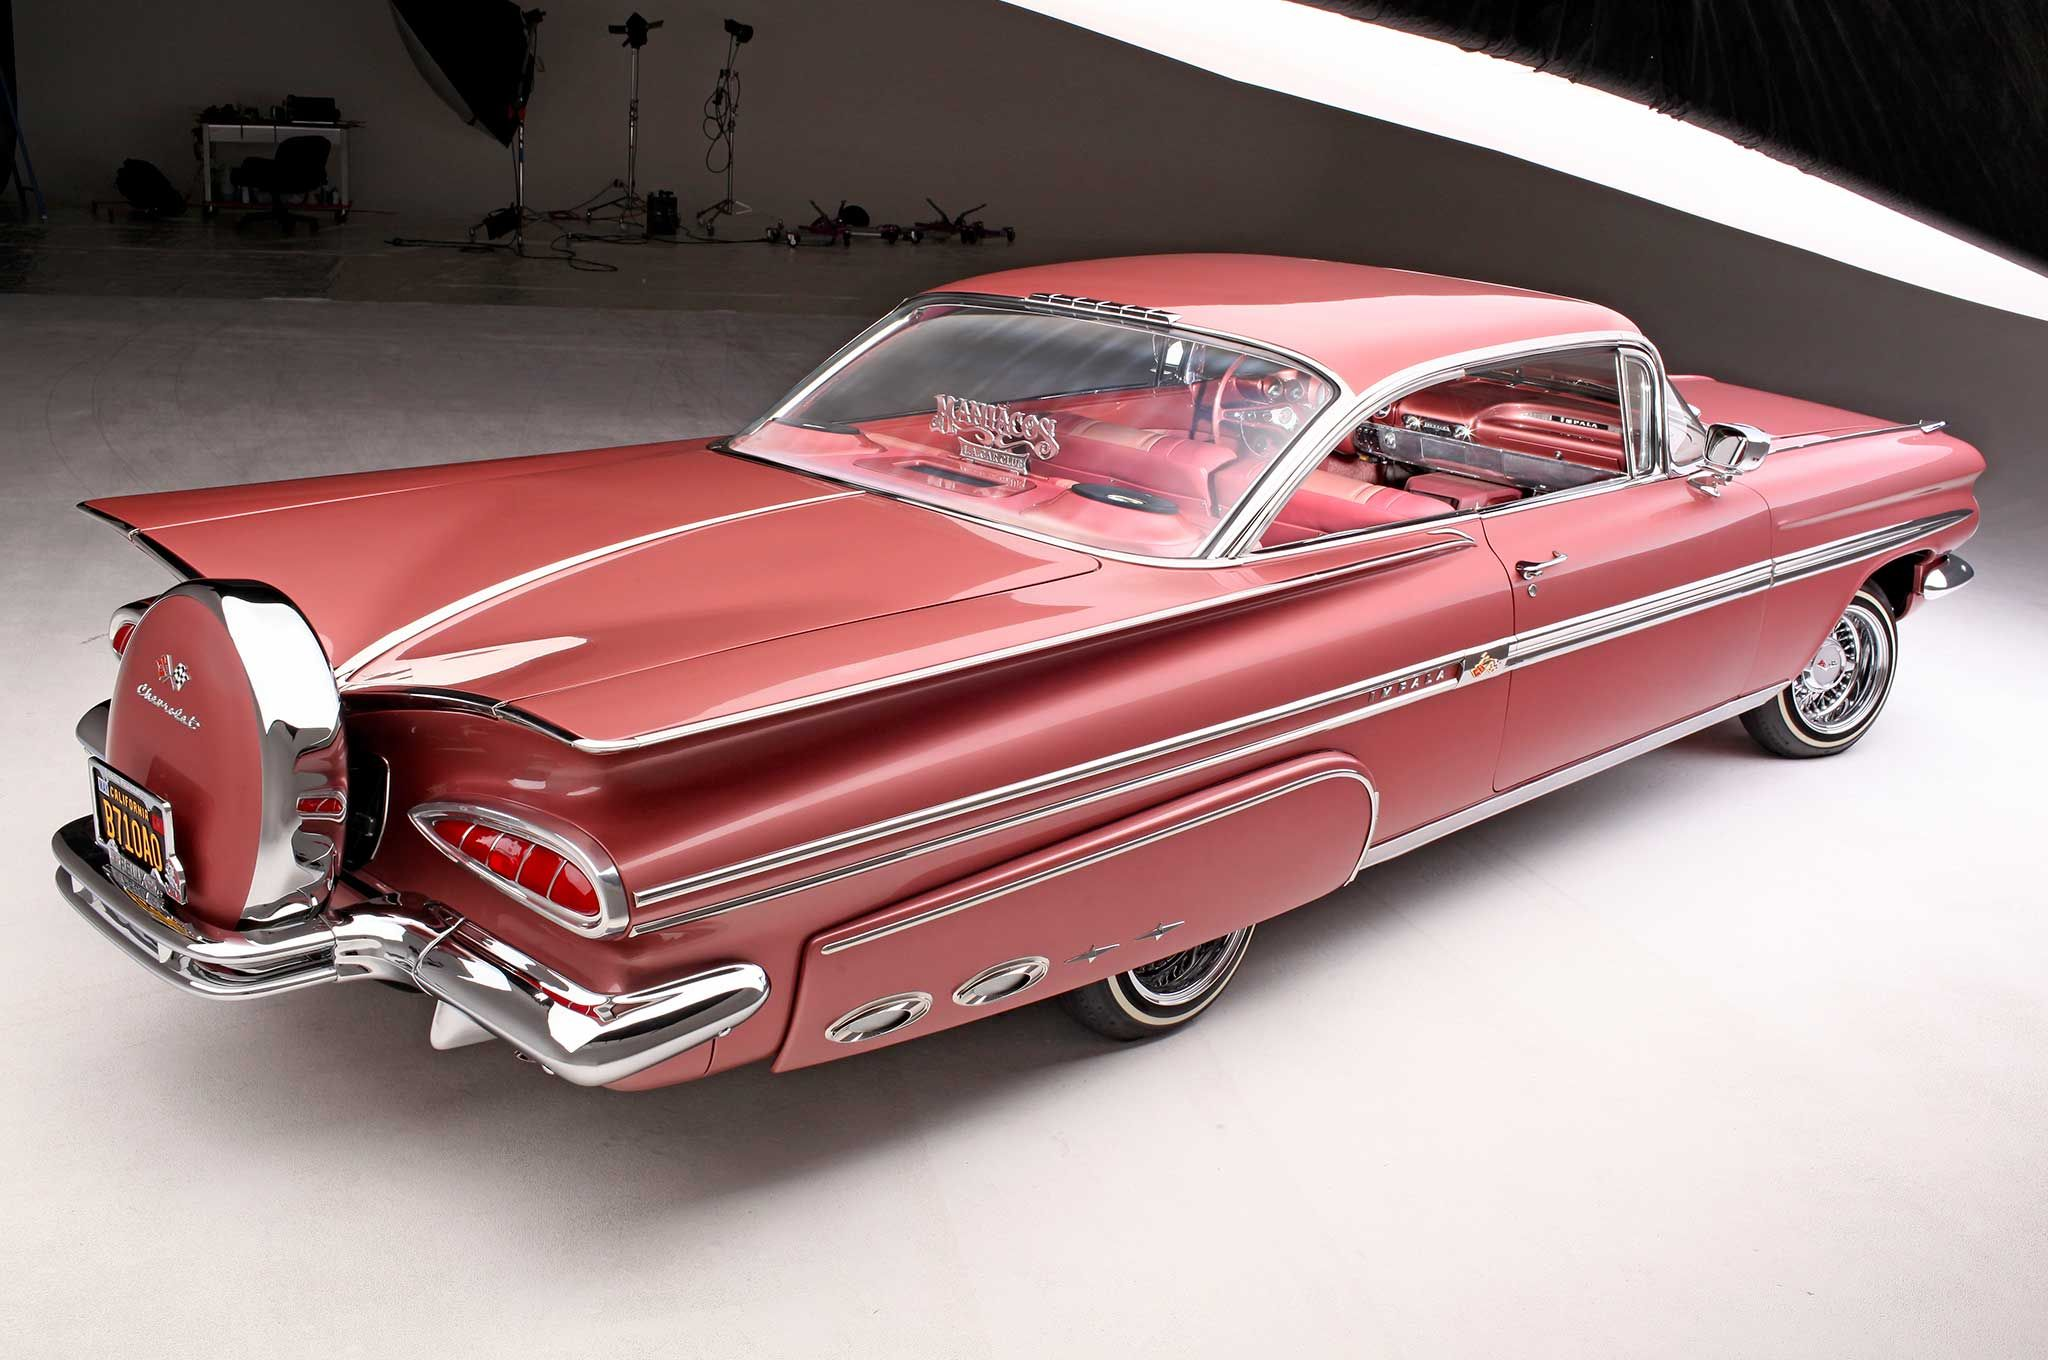 1959 chevrolet impala passenger side rear quarter view 014 [ 2048 x 1360 Pixel ]